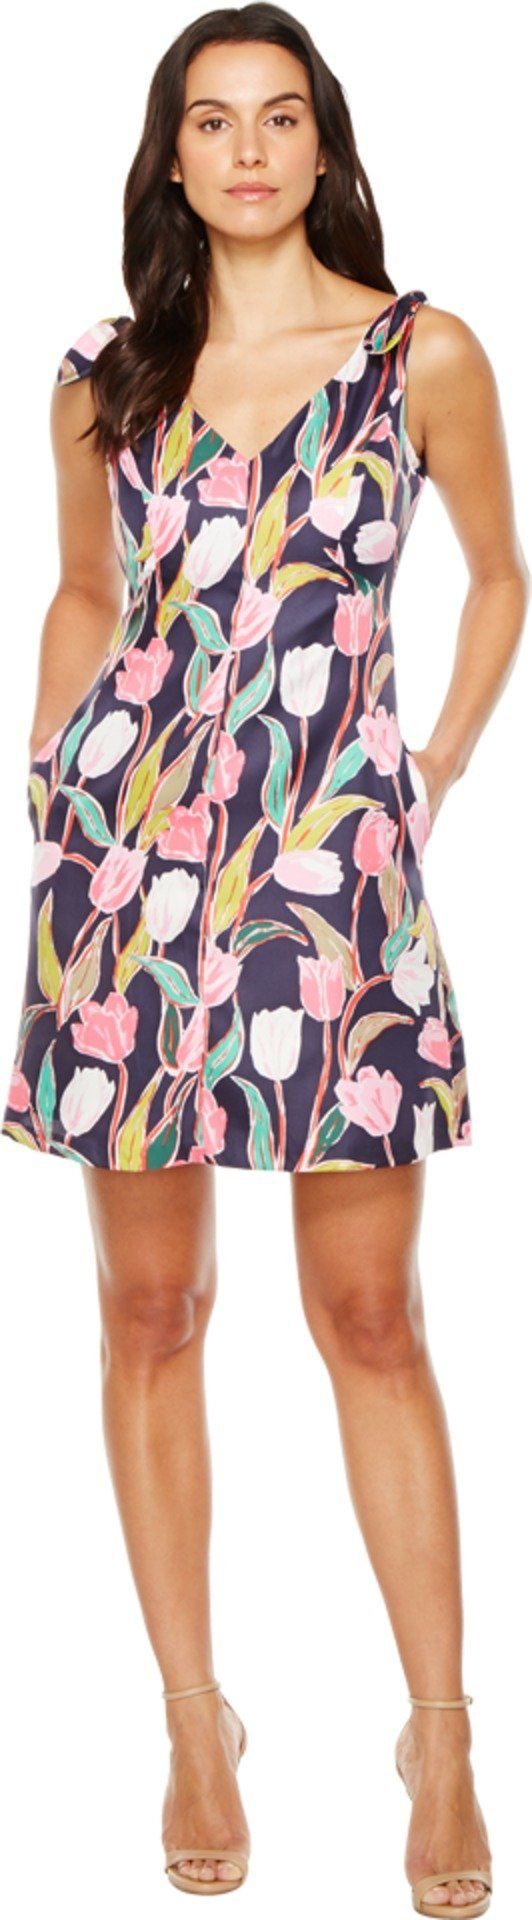 Donna Morgan Women's Tulip Print Dress, Marine Navy Multi, 4